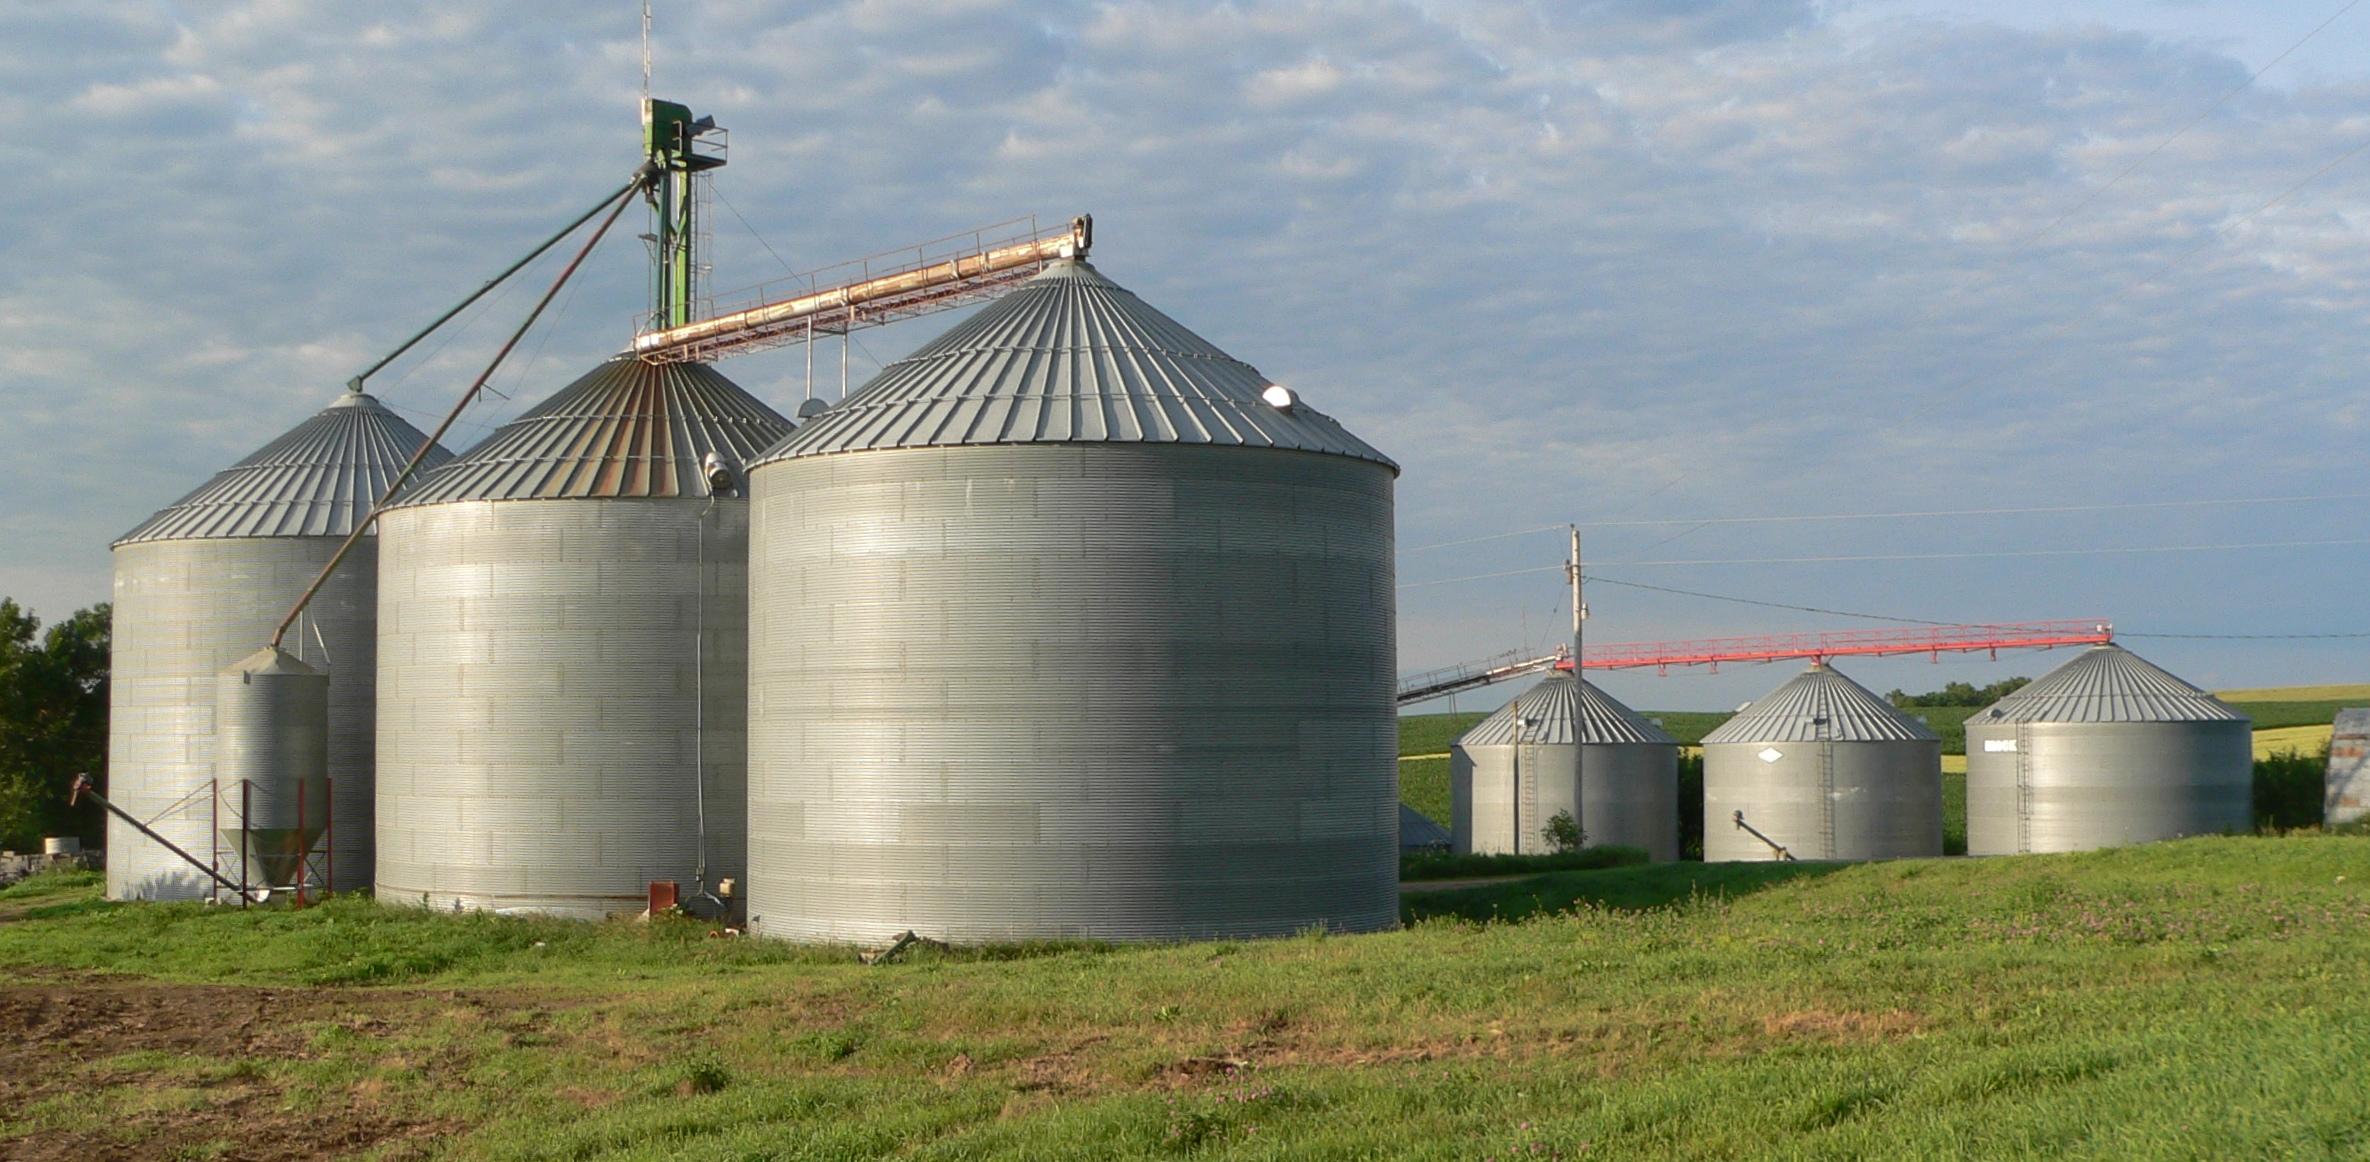 File:Sholes, Nebraska grain bins 3.JPG - Wikimedia Commons